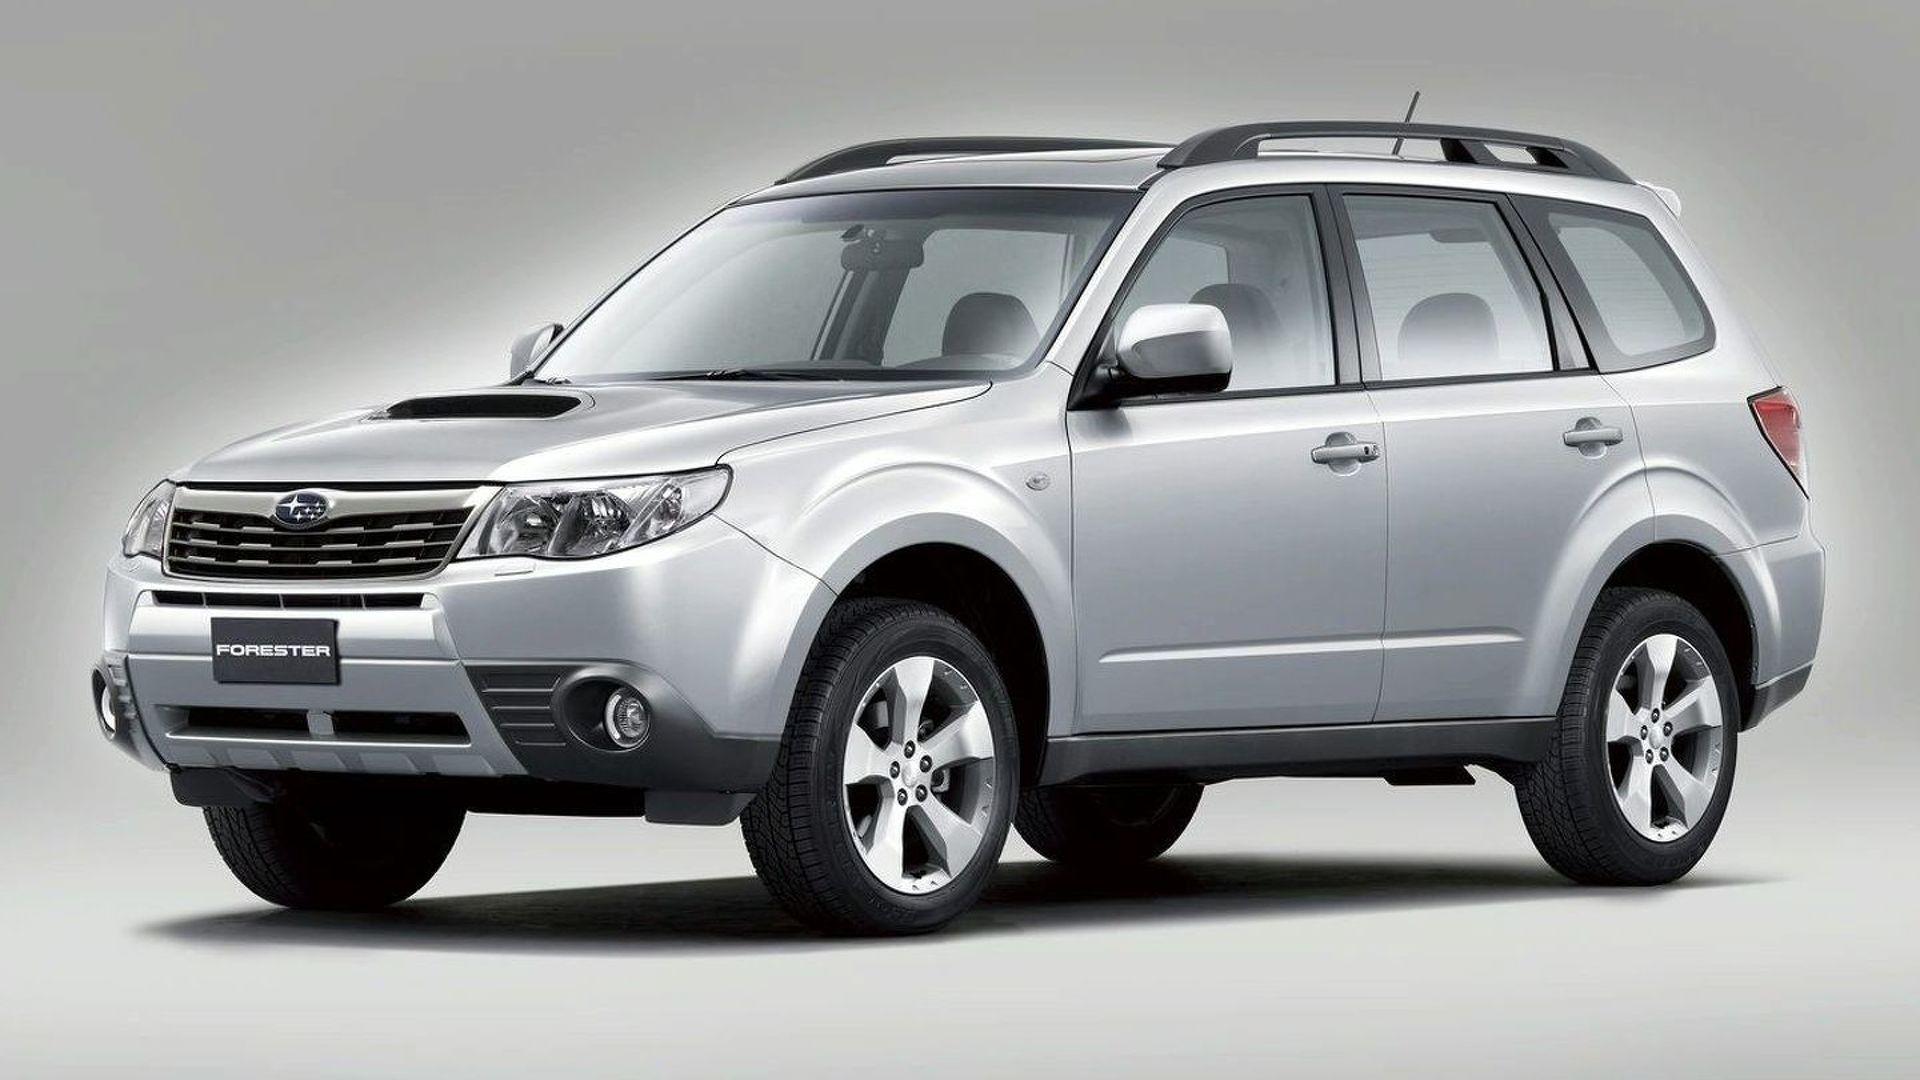 Subaru Boxer Diesel Engine Paris Debut in Forester and Impreza Models